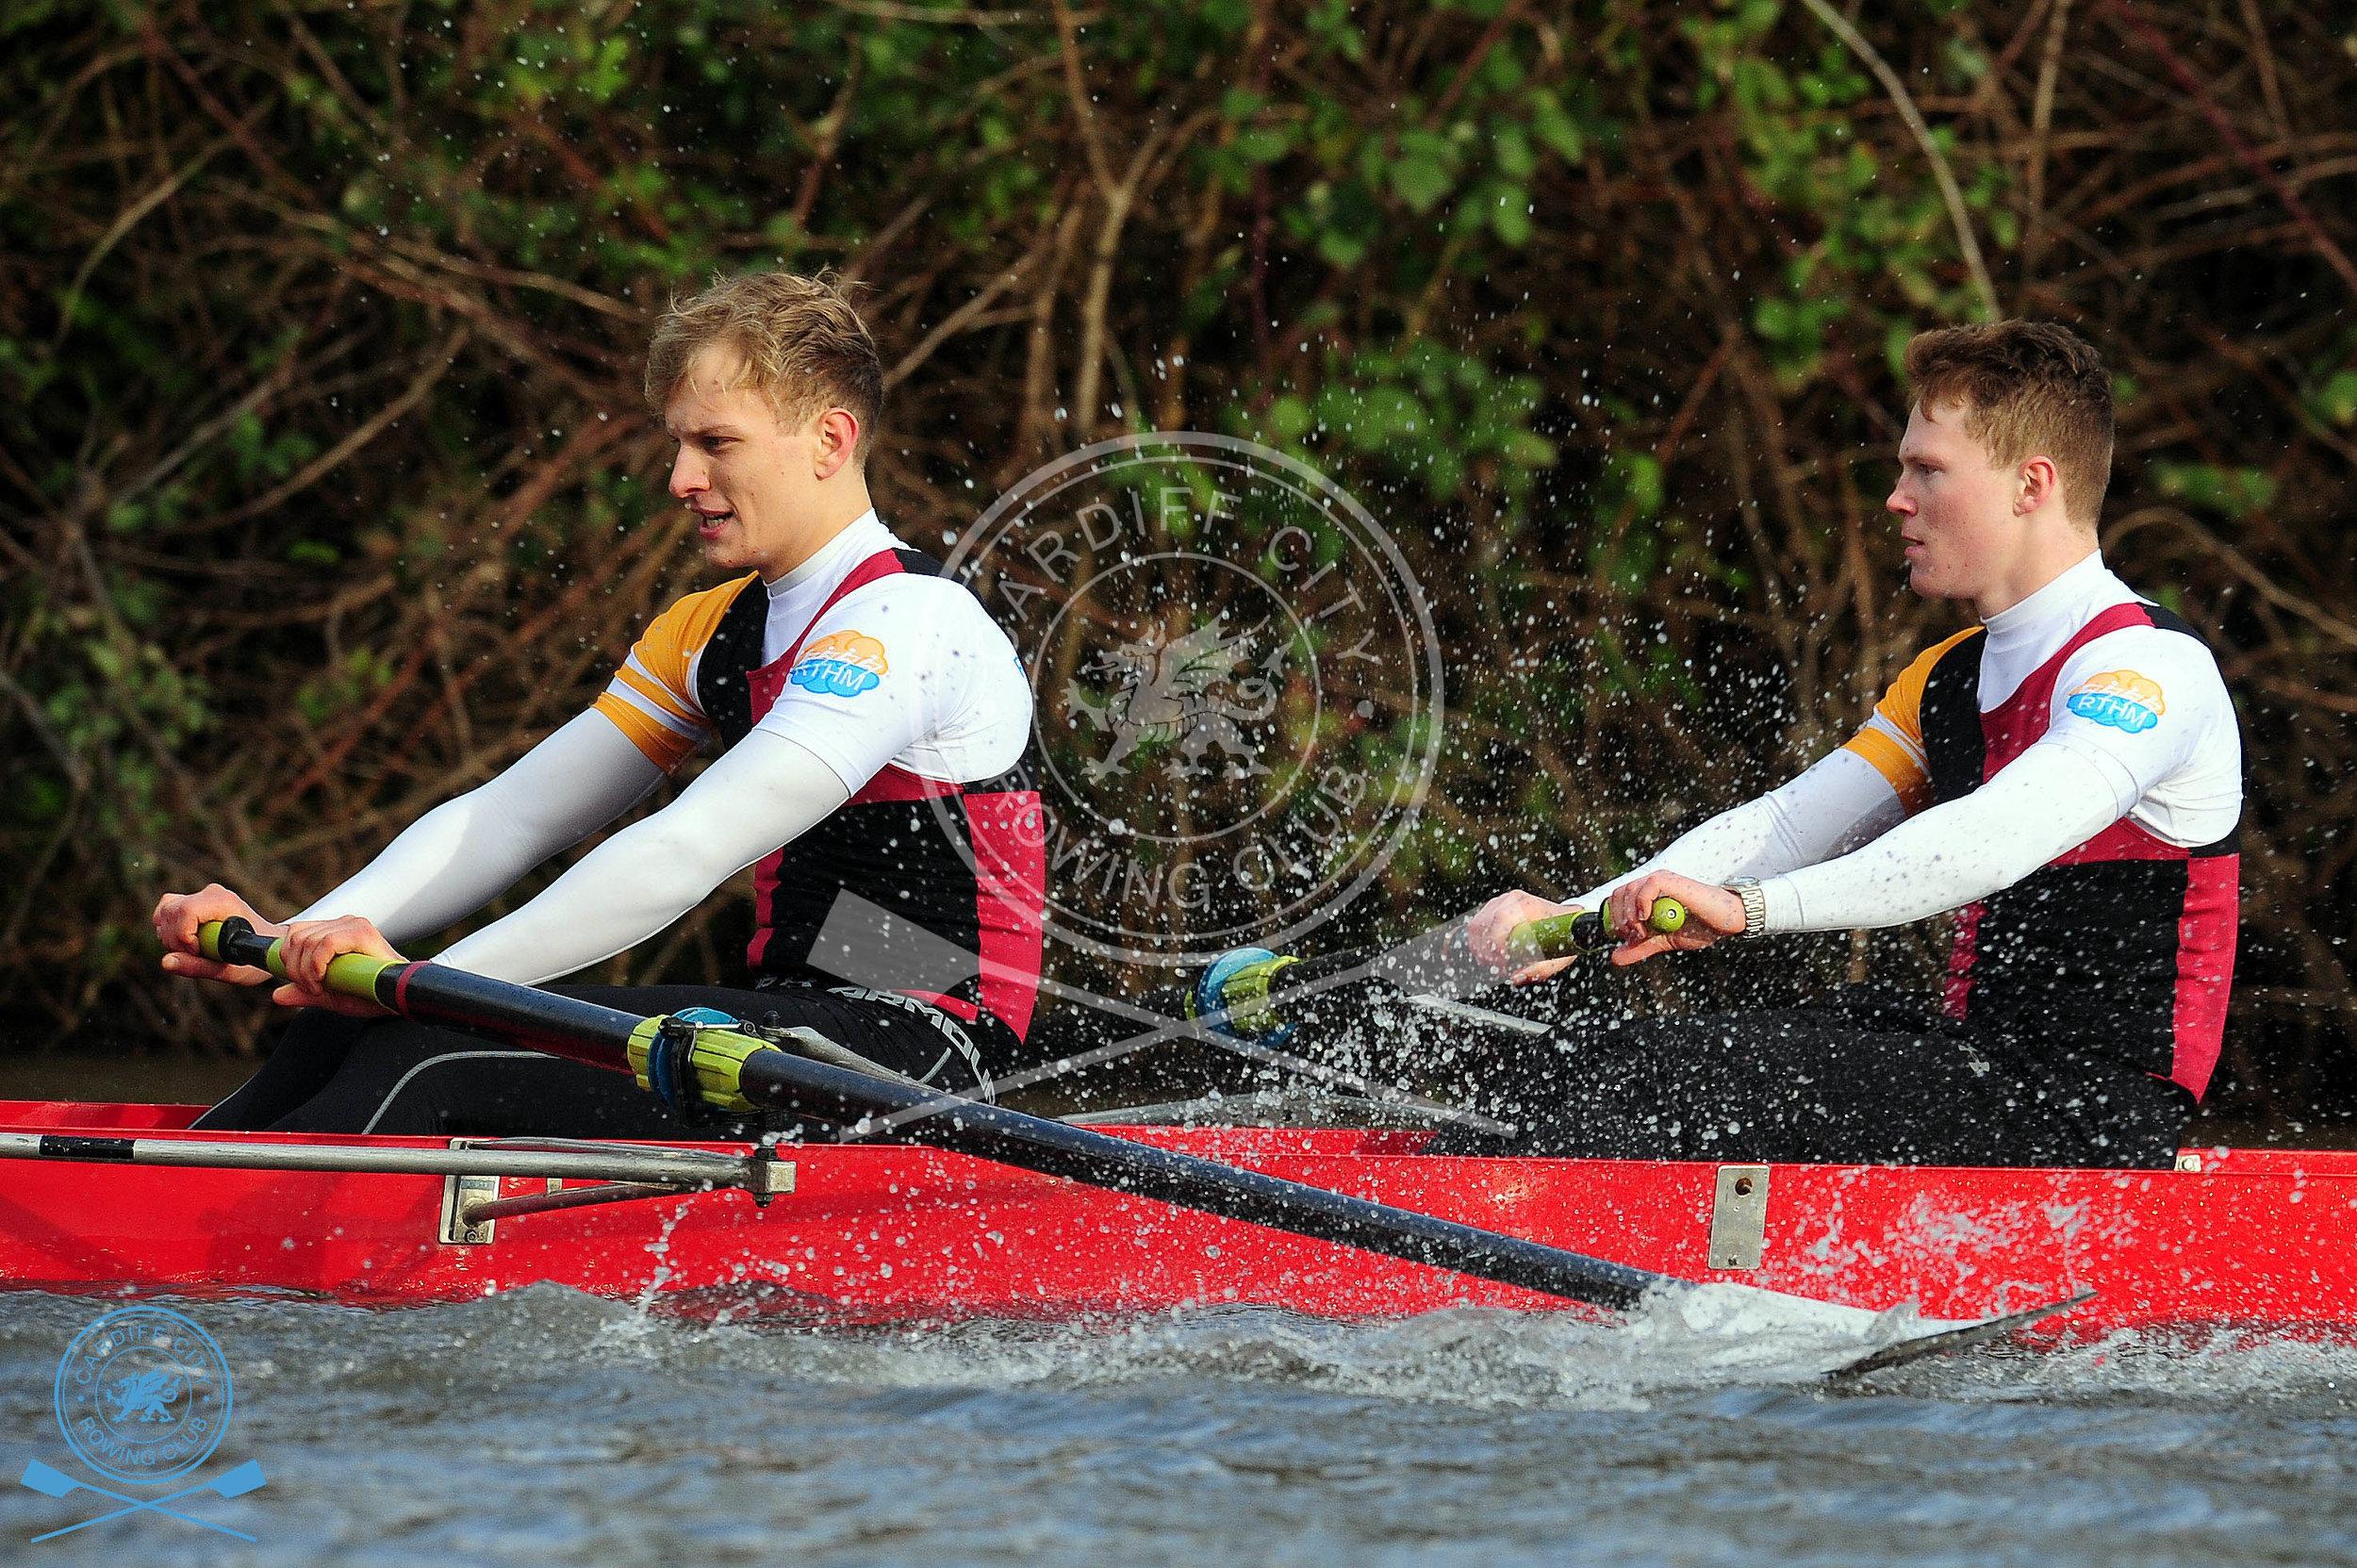 DW_280119_Cardiff_City_Rowing_266.jpg